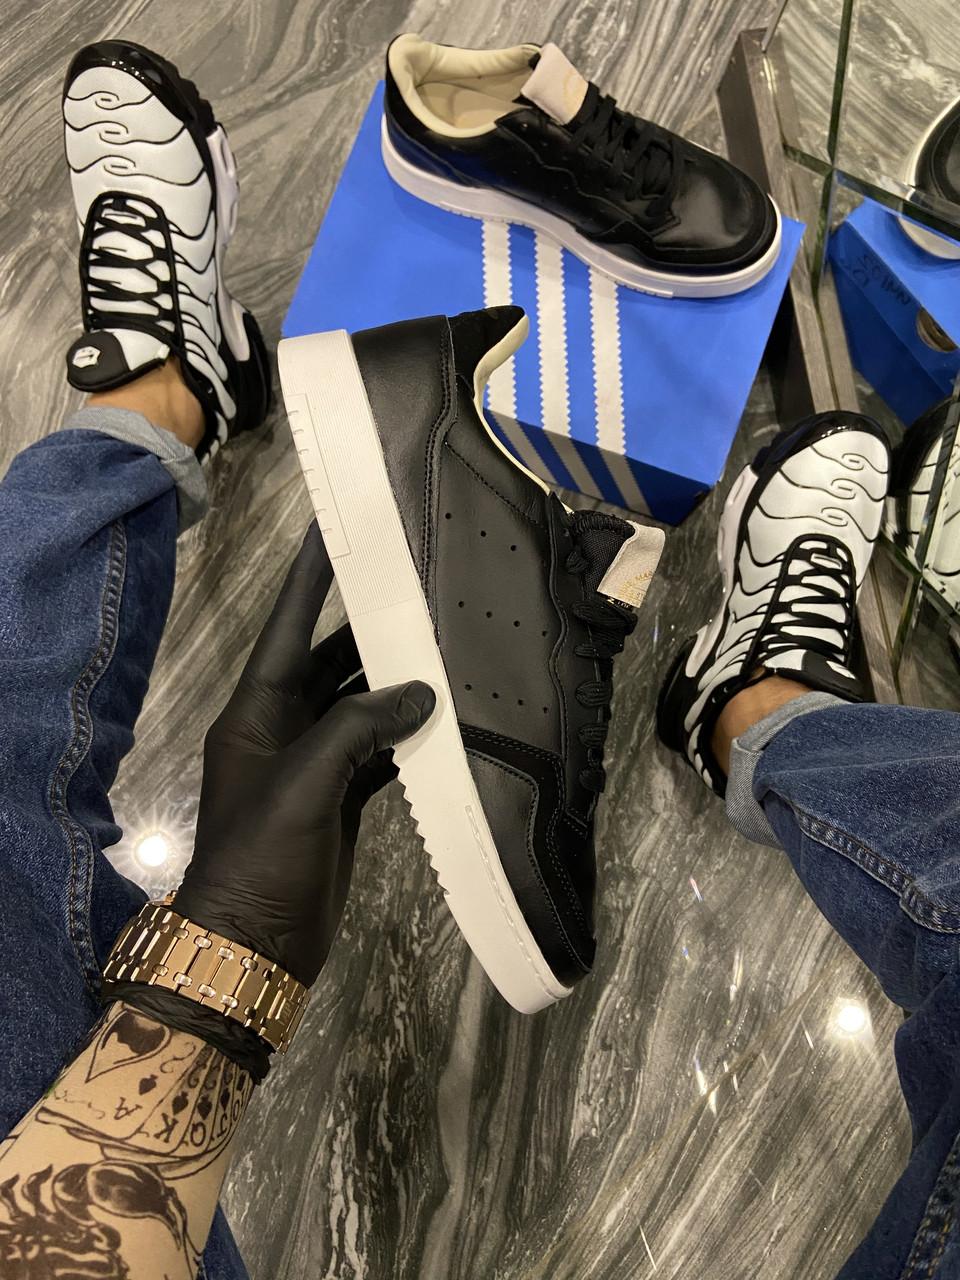 Adidas Brand With The 3 Stripes Black White (Черный)